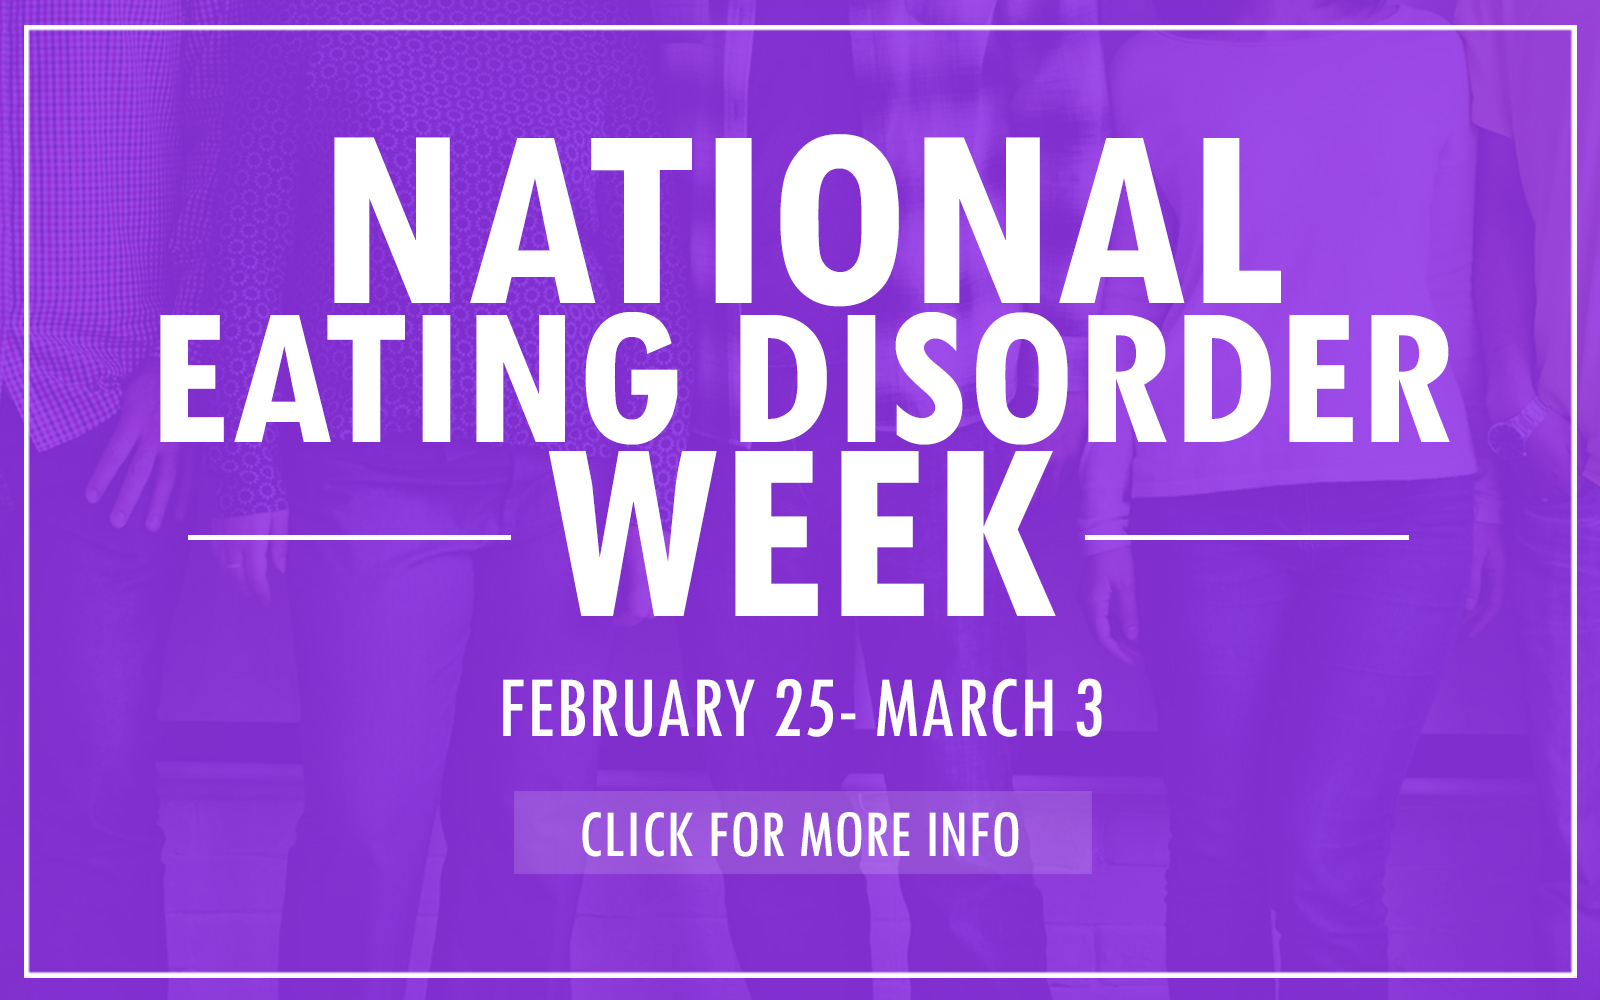 National Eating Disorder Week Website Slider